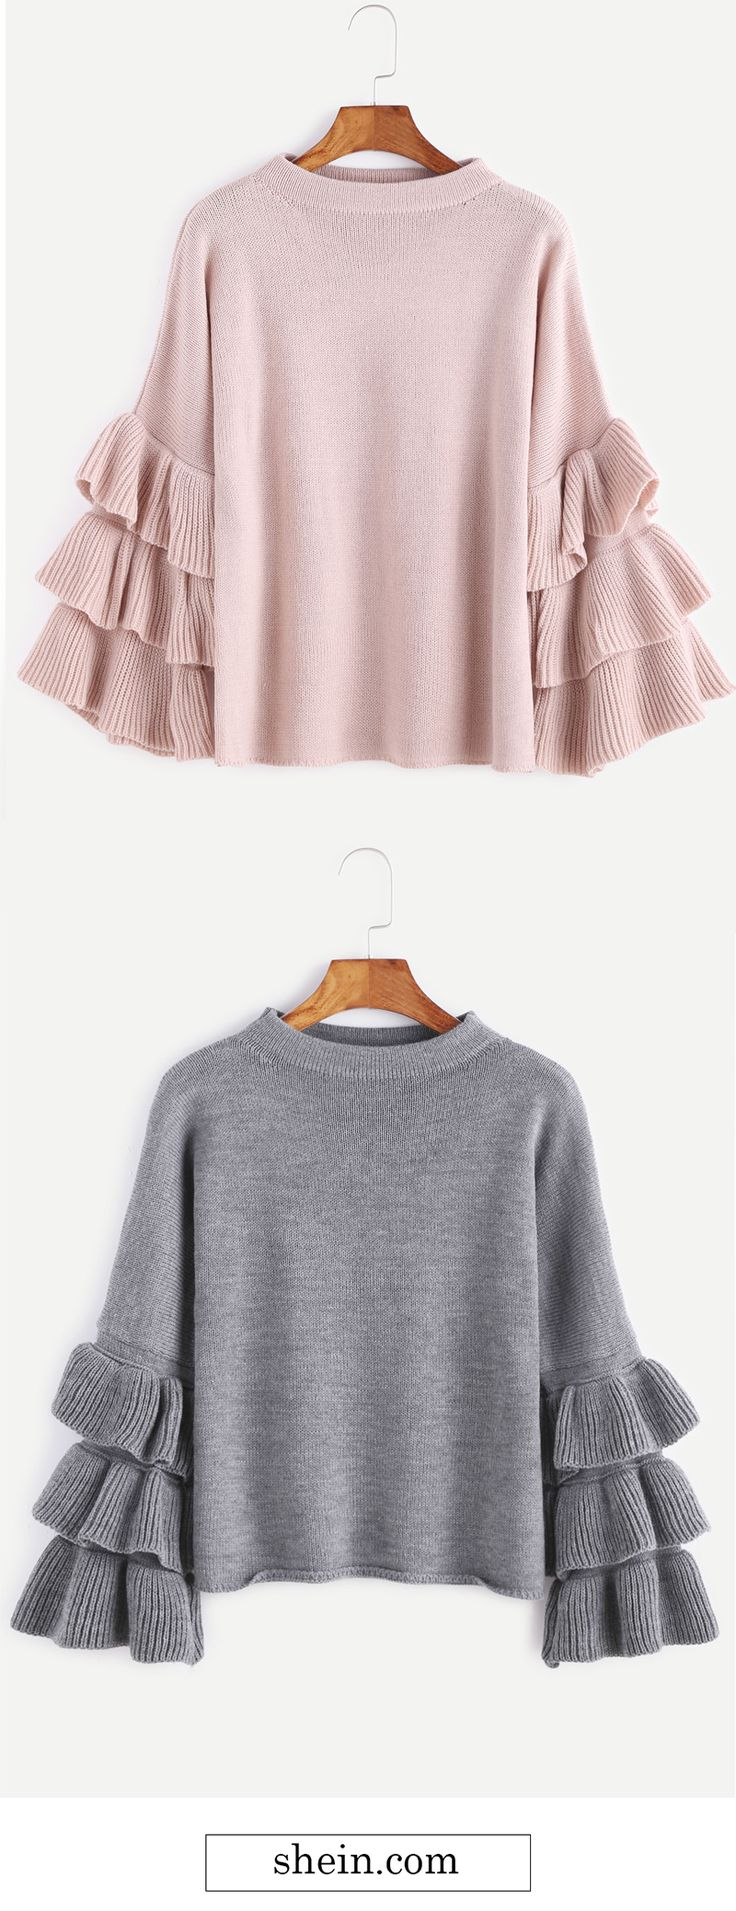 Cute layered ruffle sleeve sweater collect.